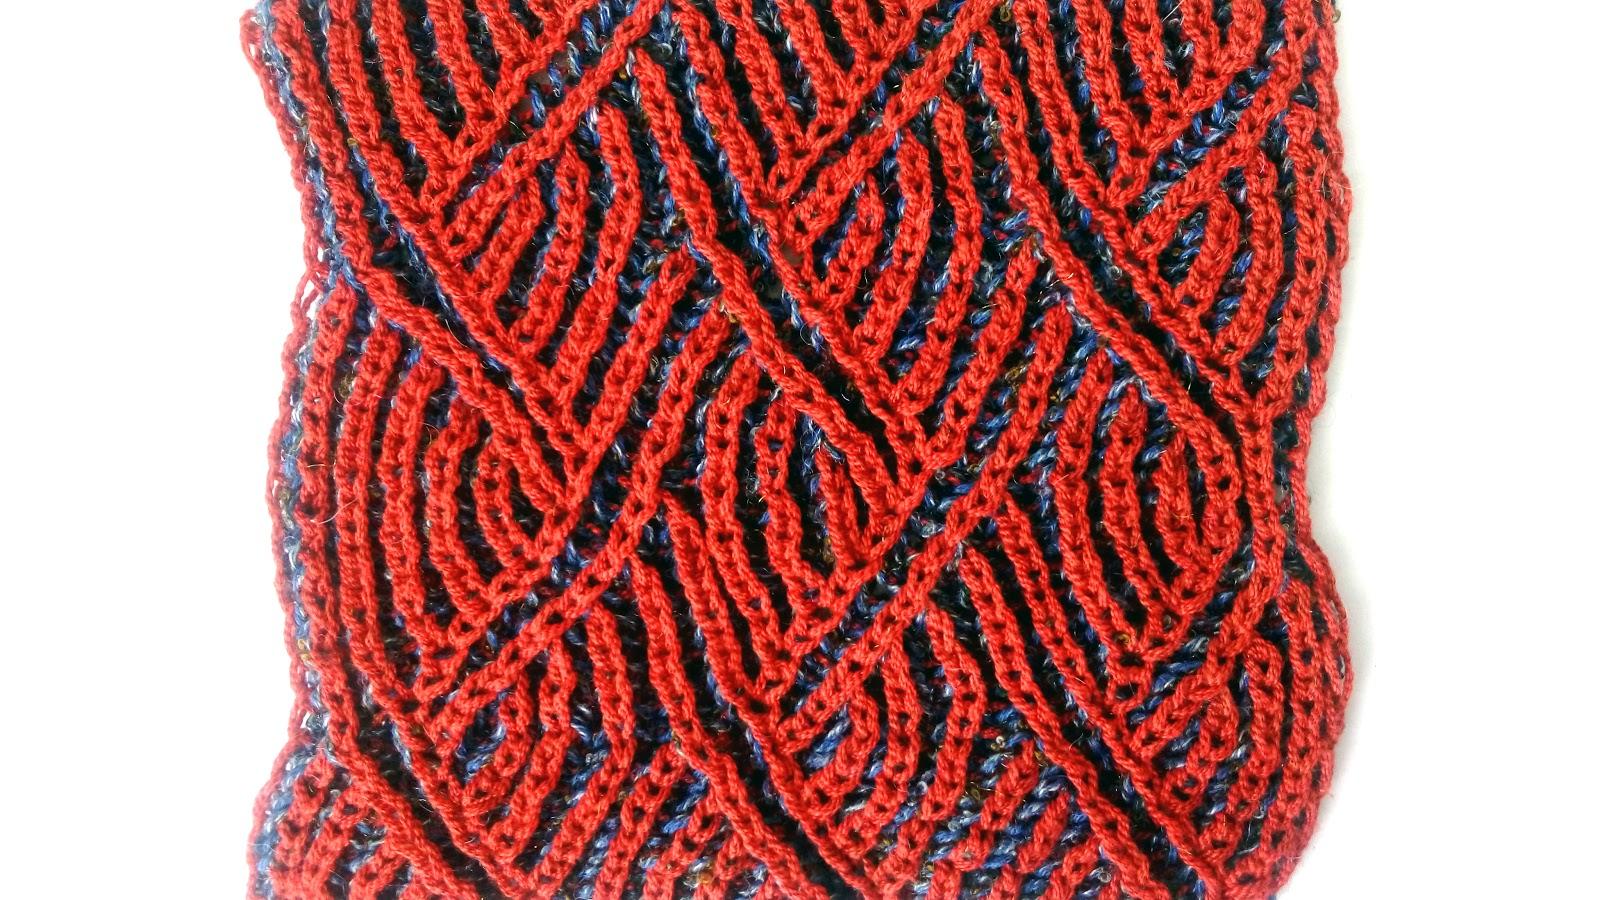 Zigzag Scarf - Brioche Knitting